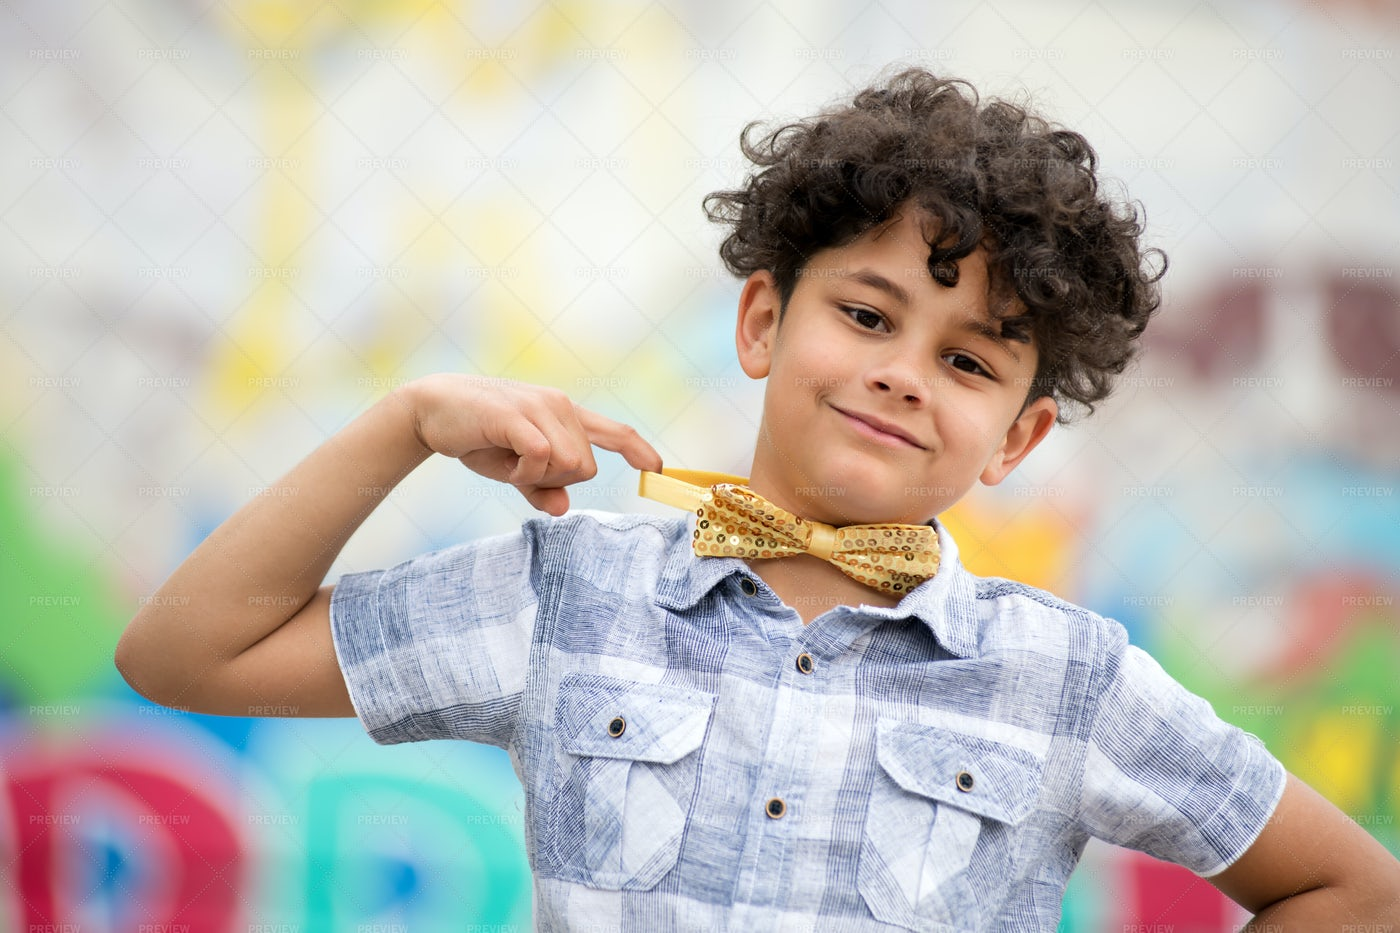 Boy With Bow Tie: Stock Photos